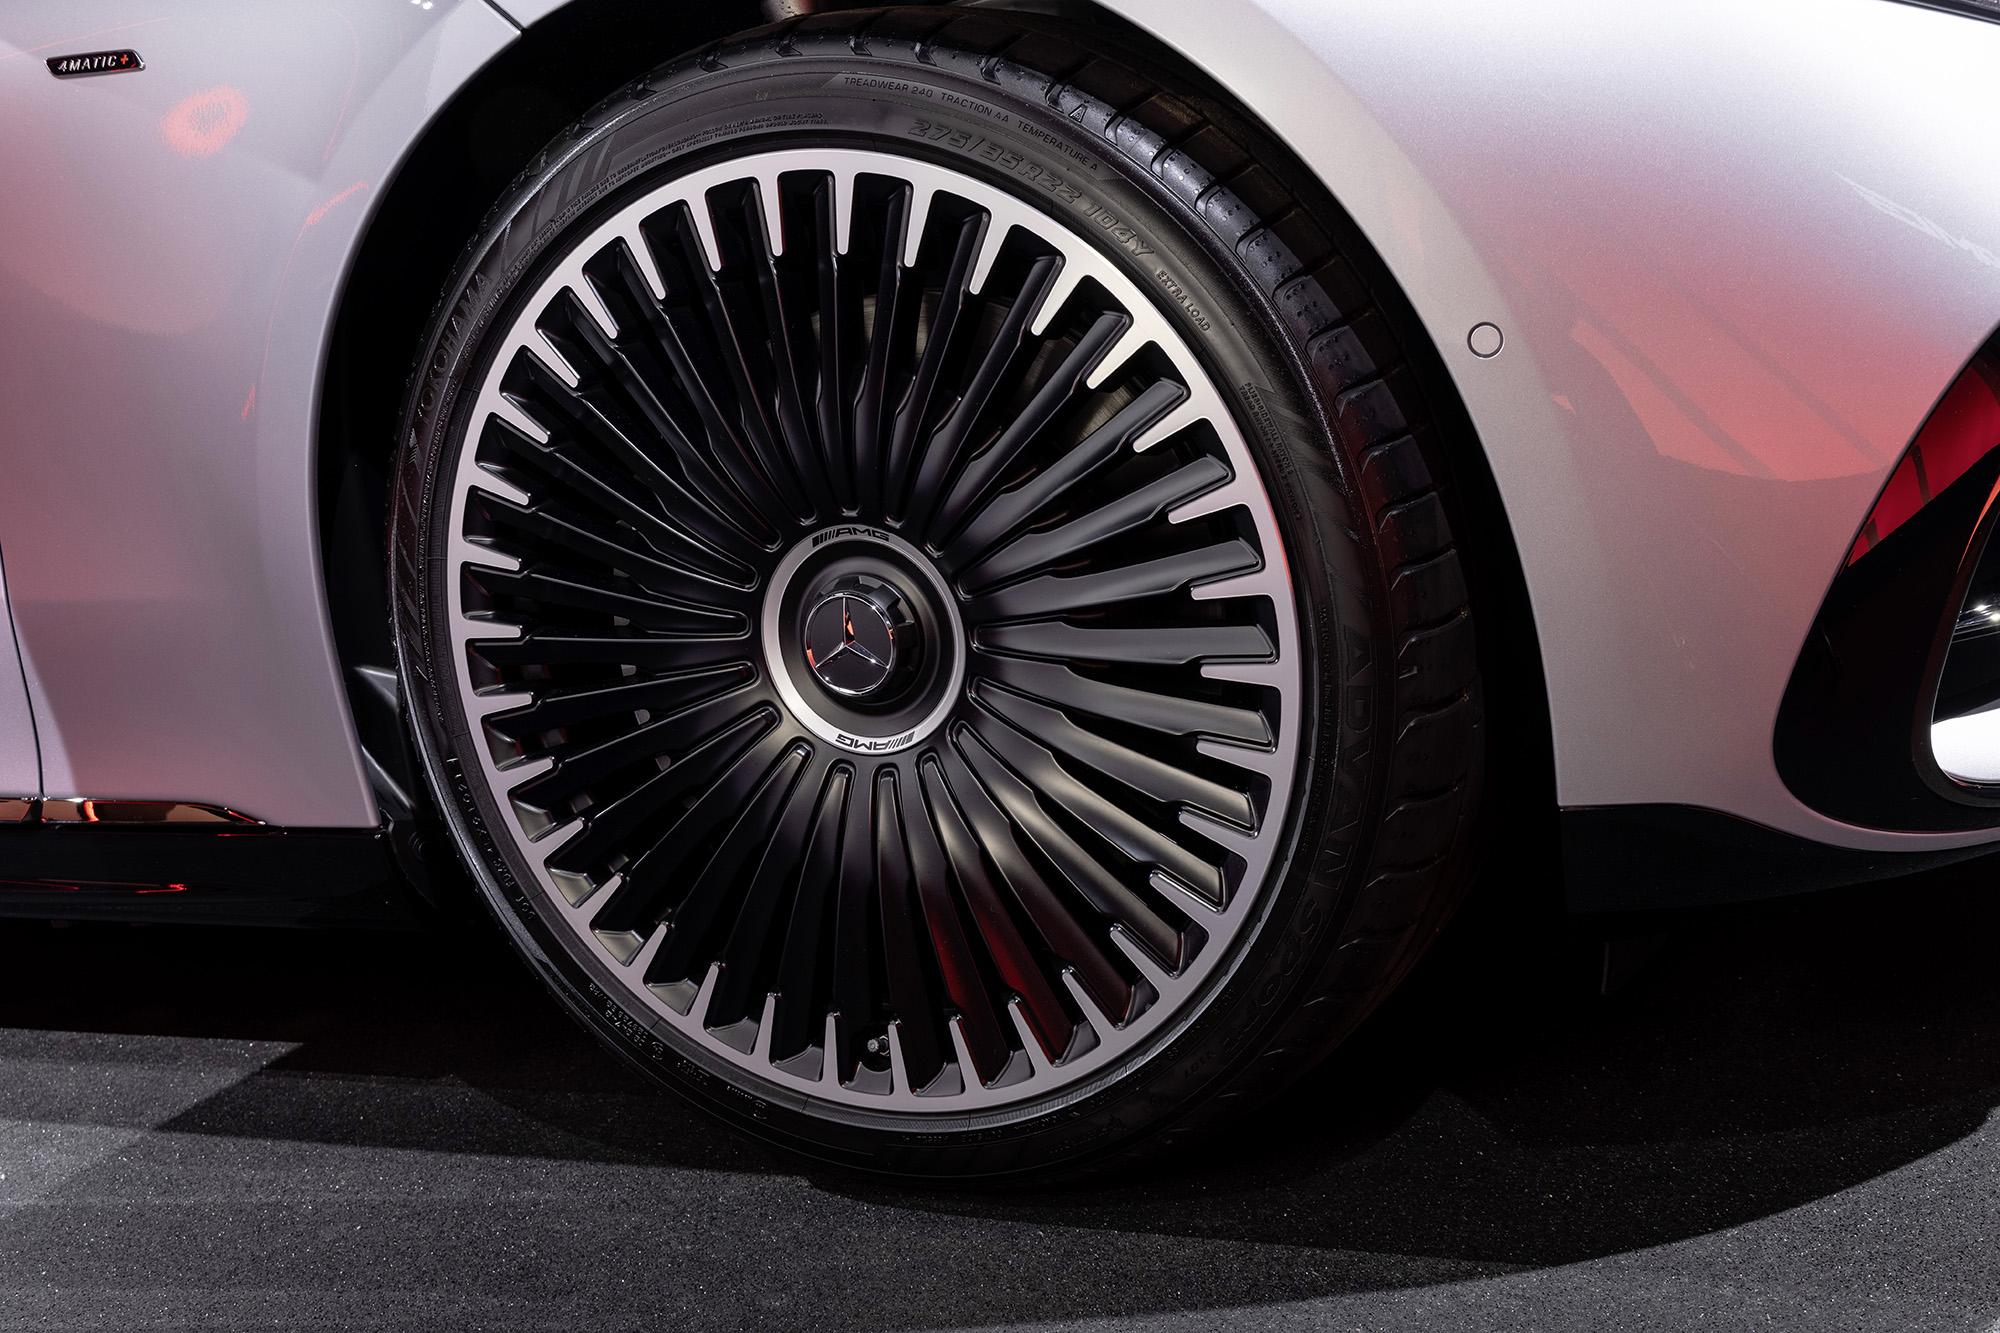 Roda do Mercedes-AMG EQS 53 4MATIC+